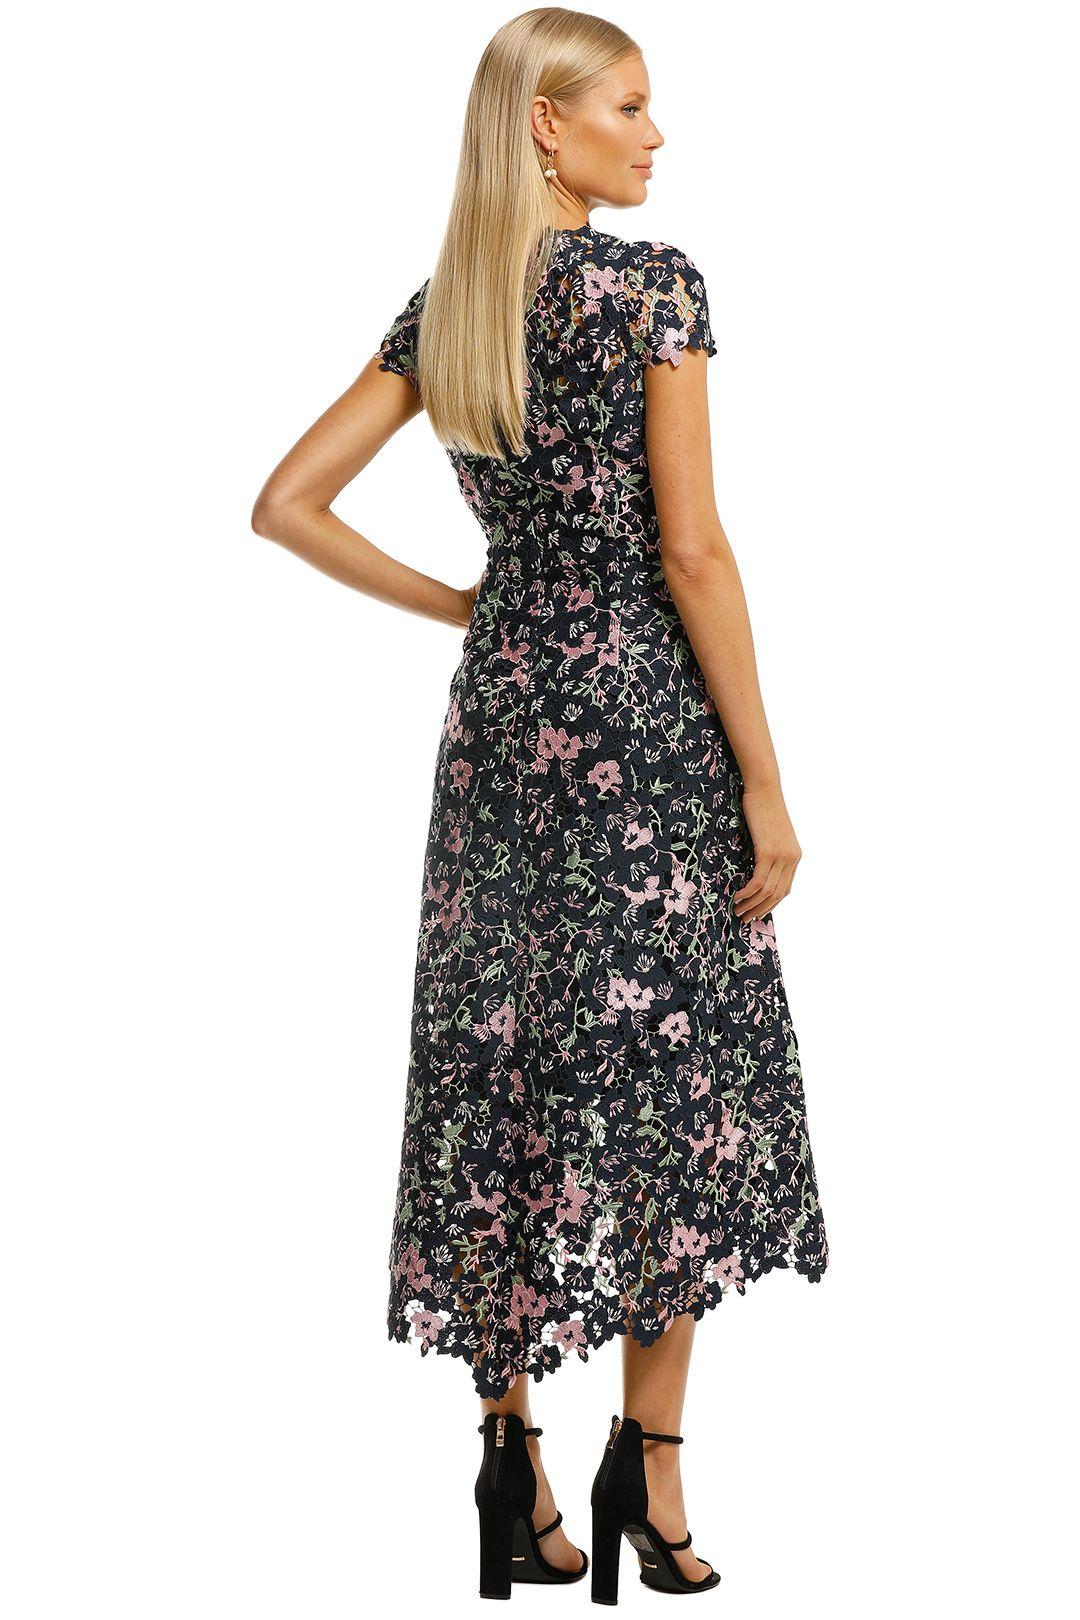 Moss-and-Spy-Birdy-Dress-Floral-Back